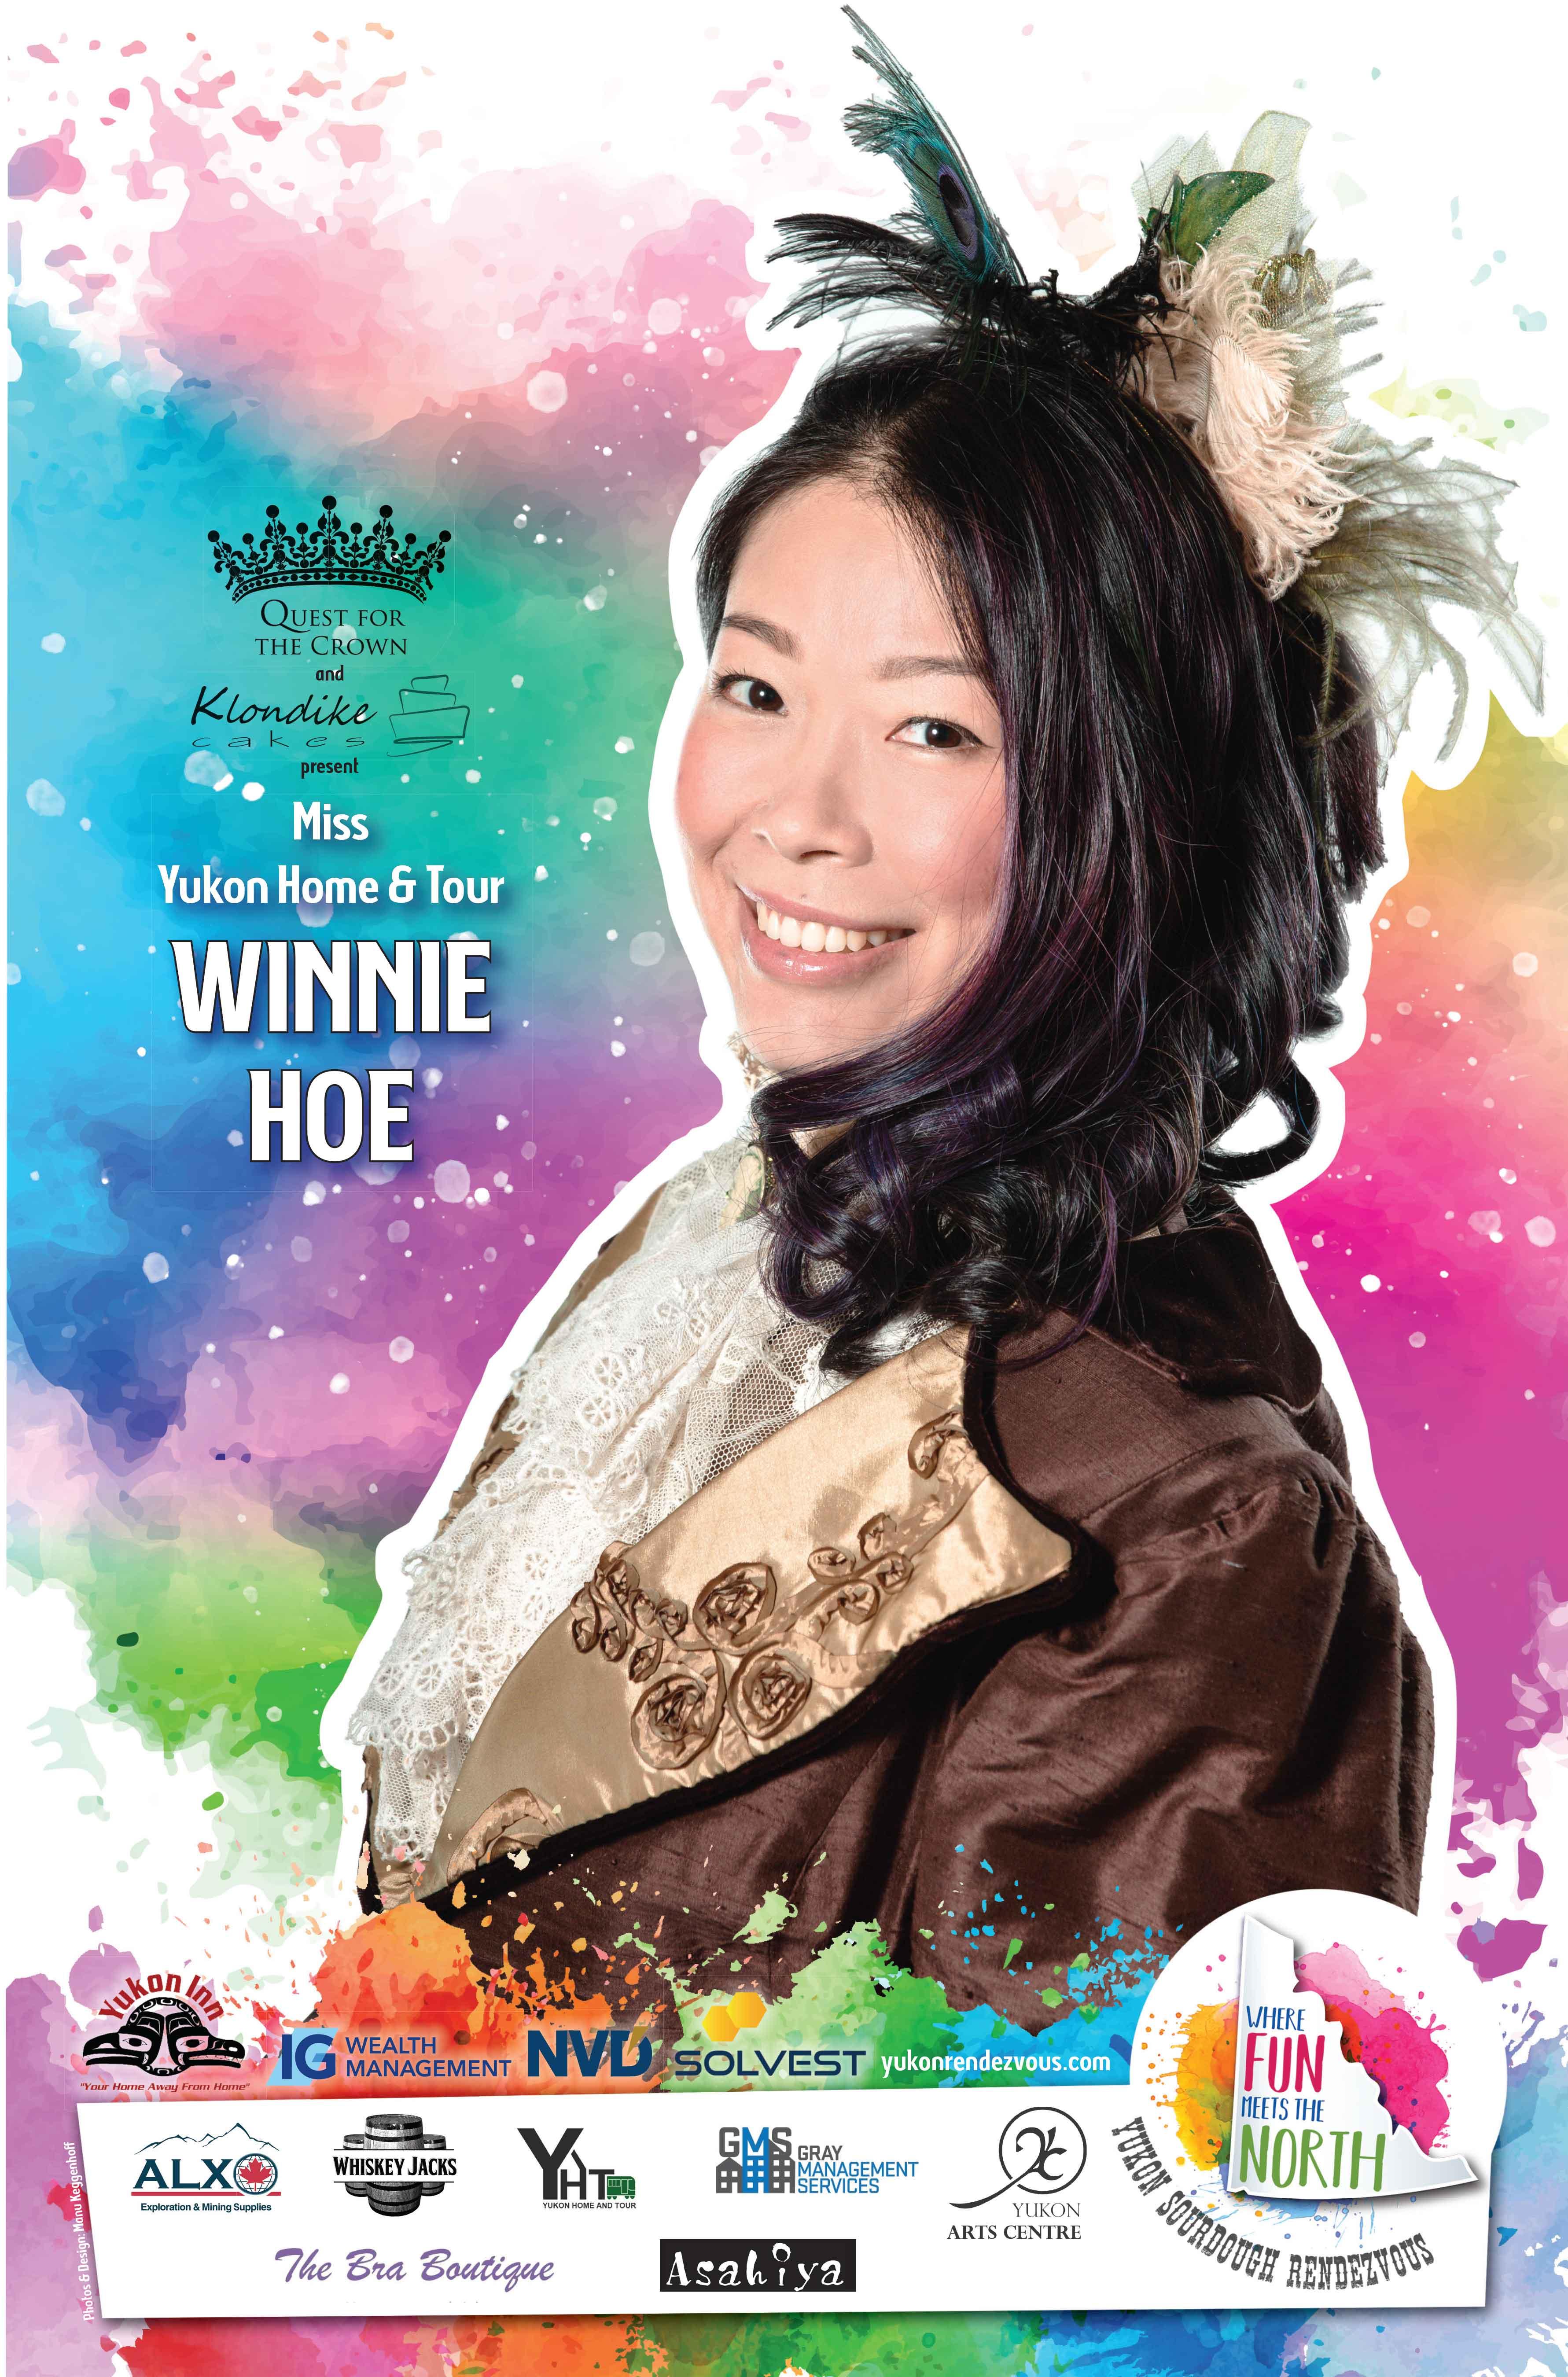 Winnie-QFTC-Headshot